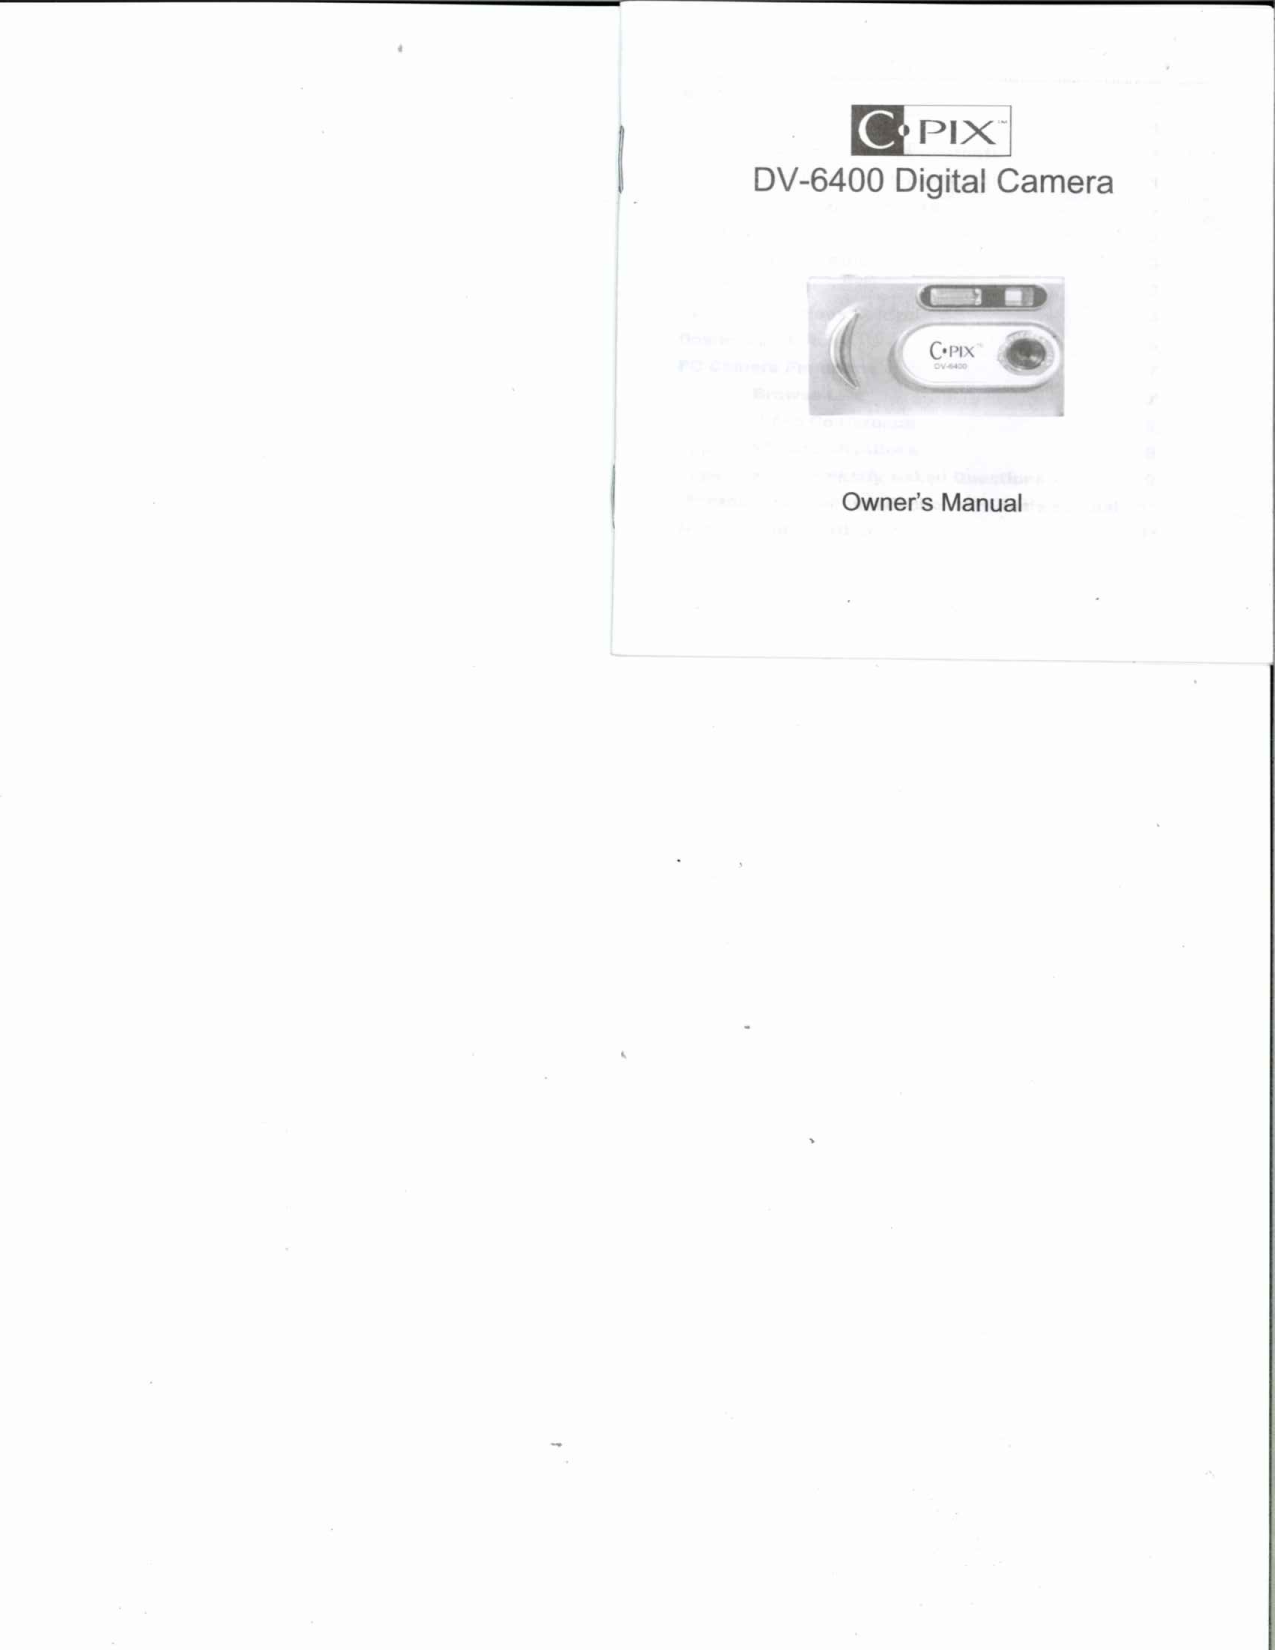 download free pdf for sima dv 6400 digital camera manual rh umlib com Digital Camera User Guide Sony Digital Camera